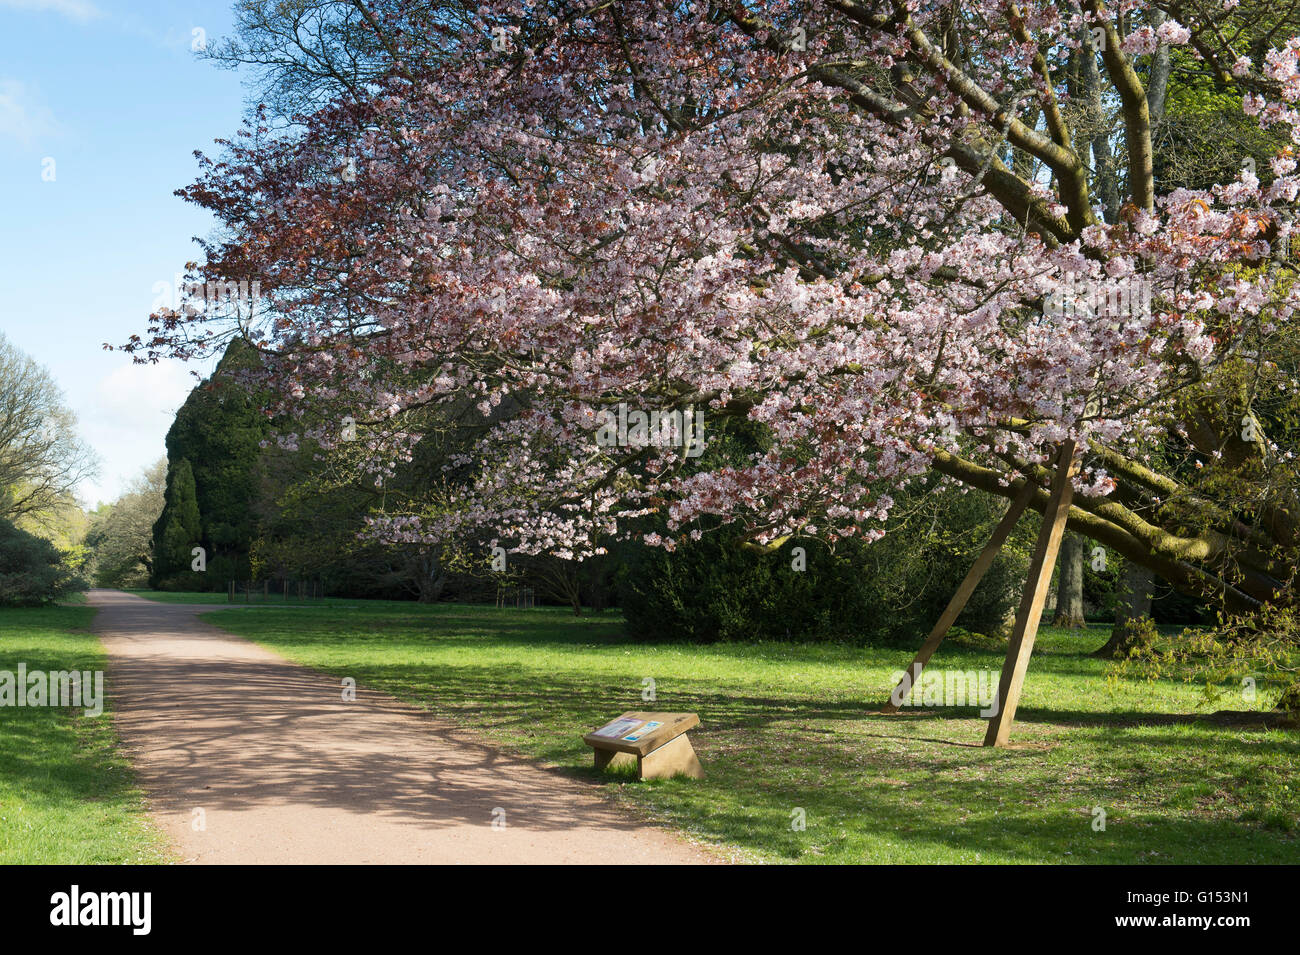 Prunus Sargentii. Sargents cherry tree in blossom at Westonbirt Arboretum. Gloucestershire, England Stock Photo